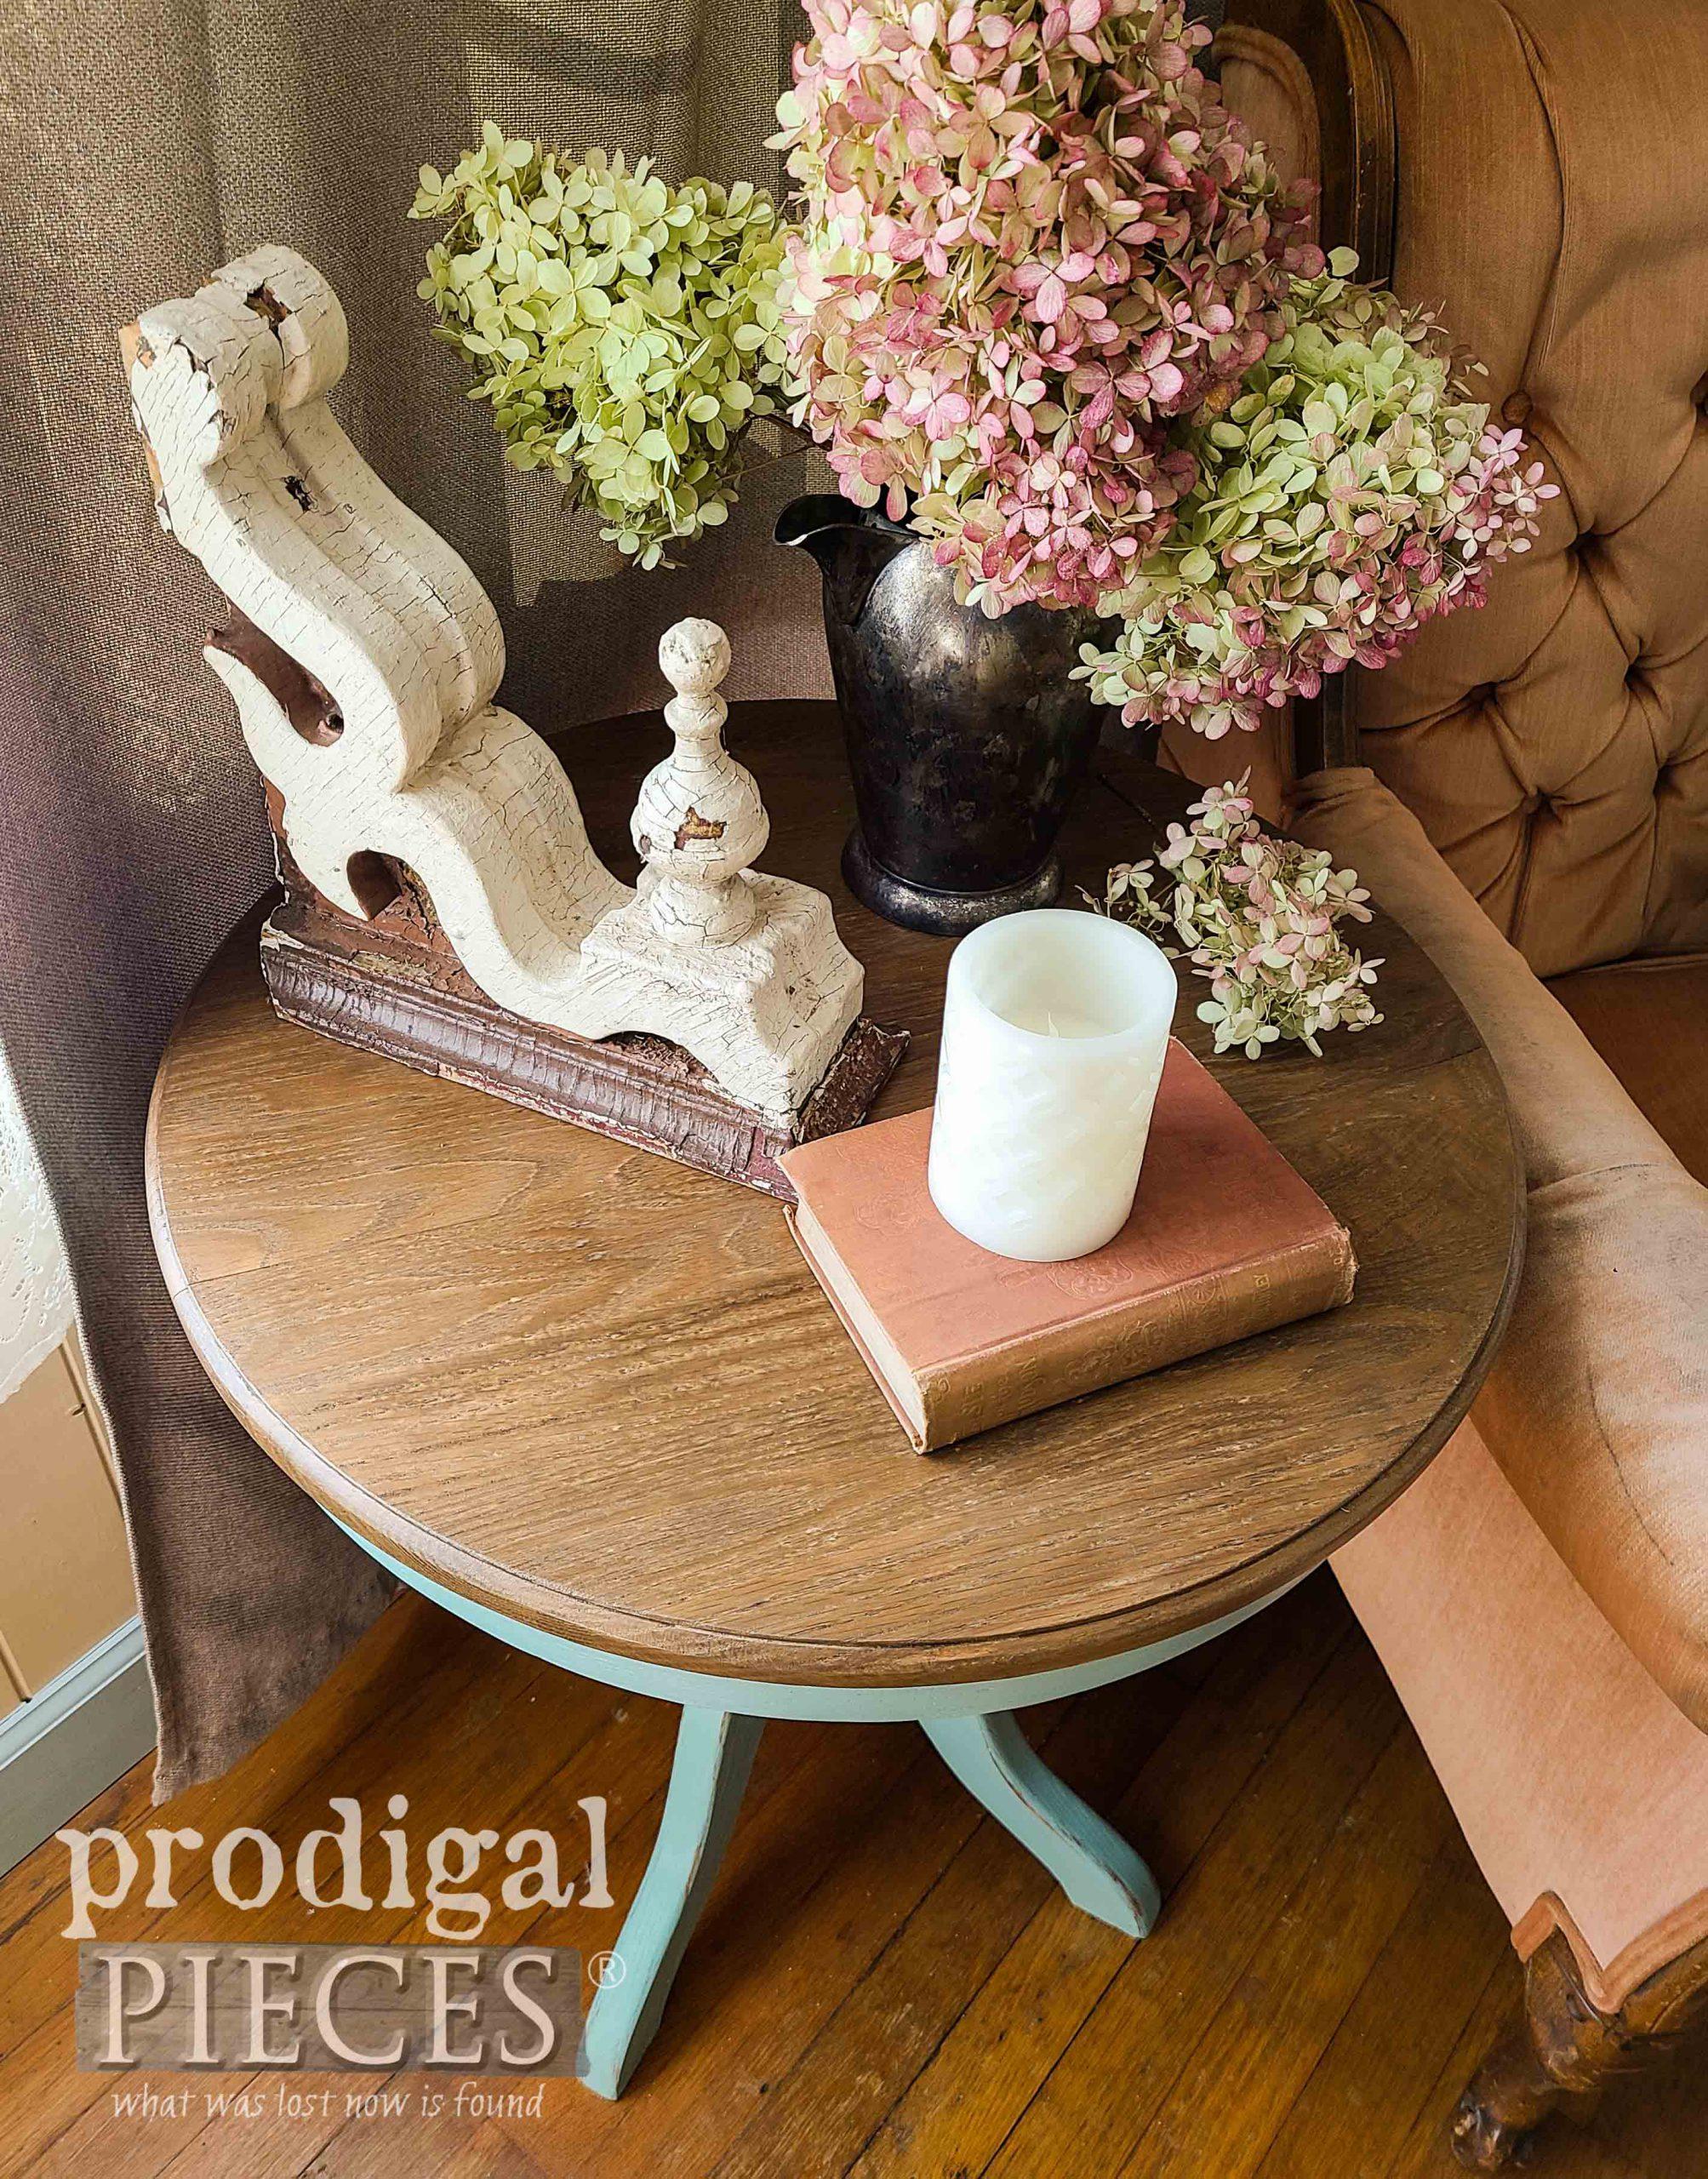 Oak Pedestal Table Top by Larissa of Prodigal Pieces | prodigalpieces.com #prodigalpieces #furniture #diy #home #homedecor